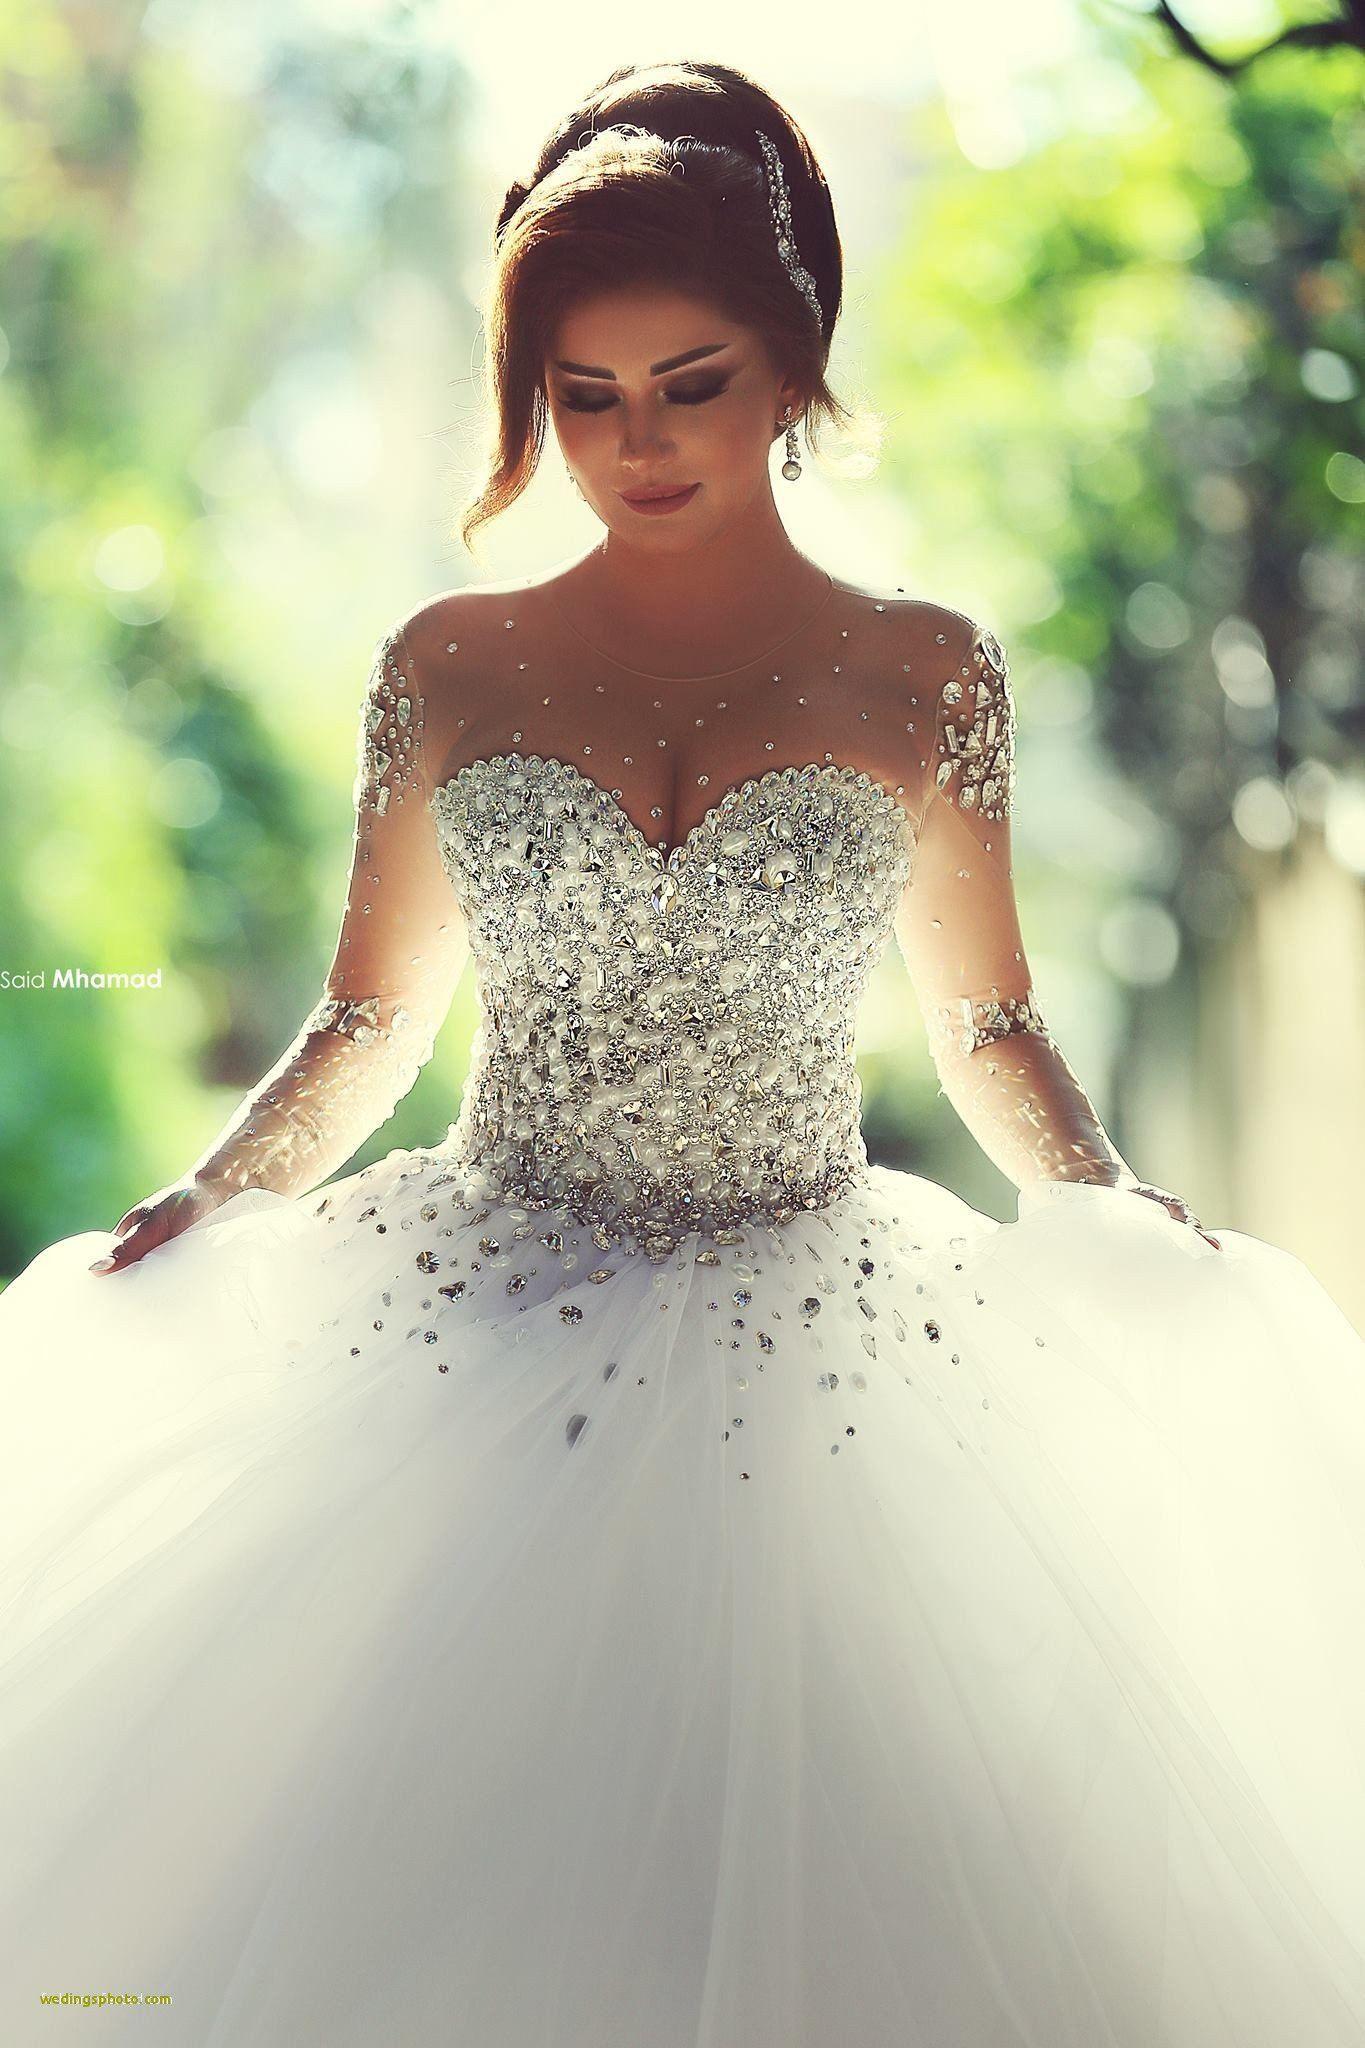 Plus Size Camo Wedding Dresses New Best Cheap Plus Size Camo Wedding Dresses In 2020 Sheer Wedding Dress Ball Gowns Wedding Ball Gown Wedding Dress